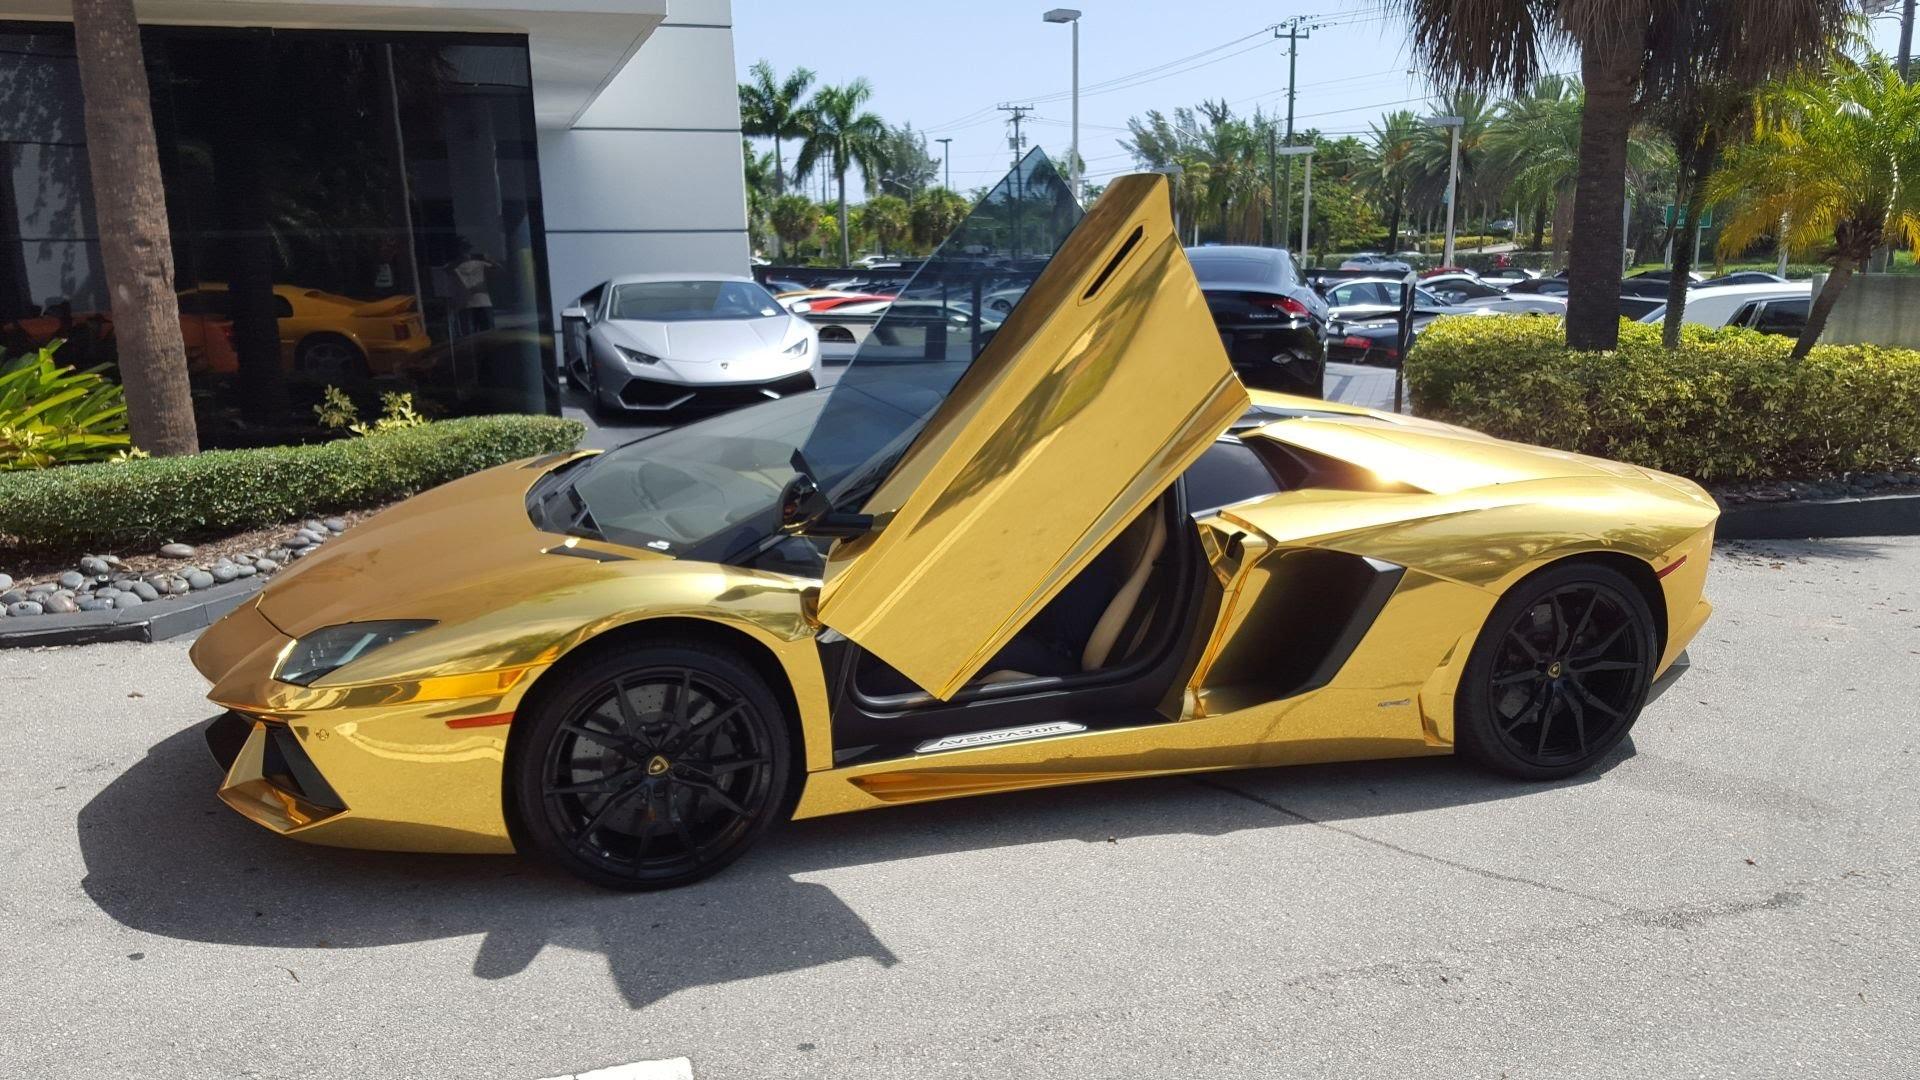 Download Original Size. ,. Lamborghini Veneno Gold Edition HD desktop  wallpaper Widescreen …